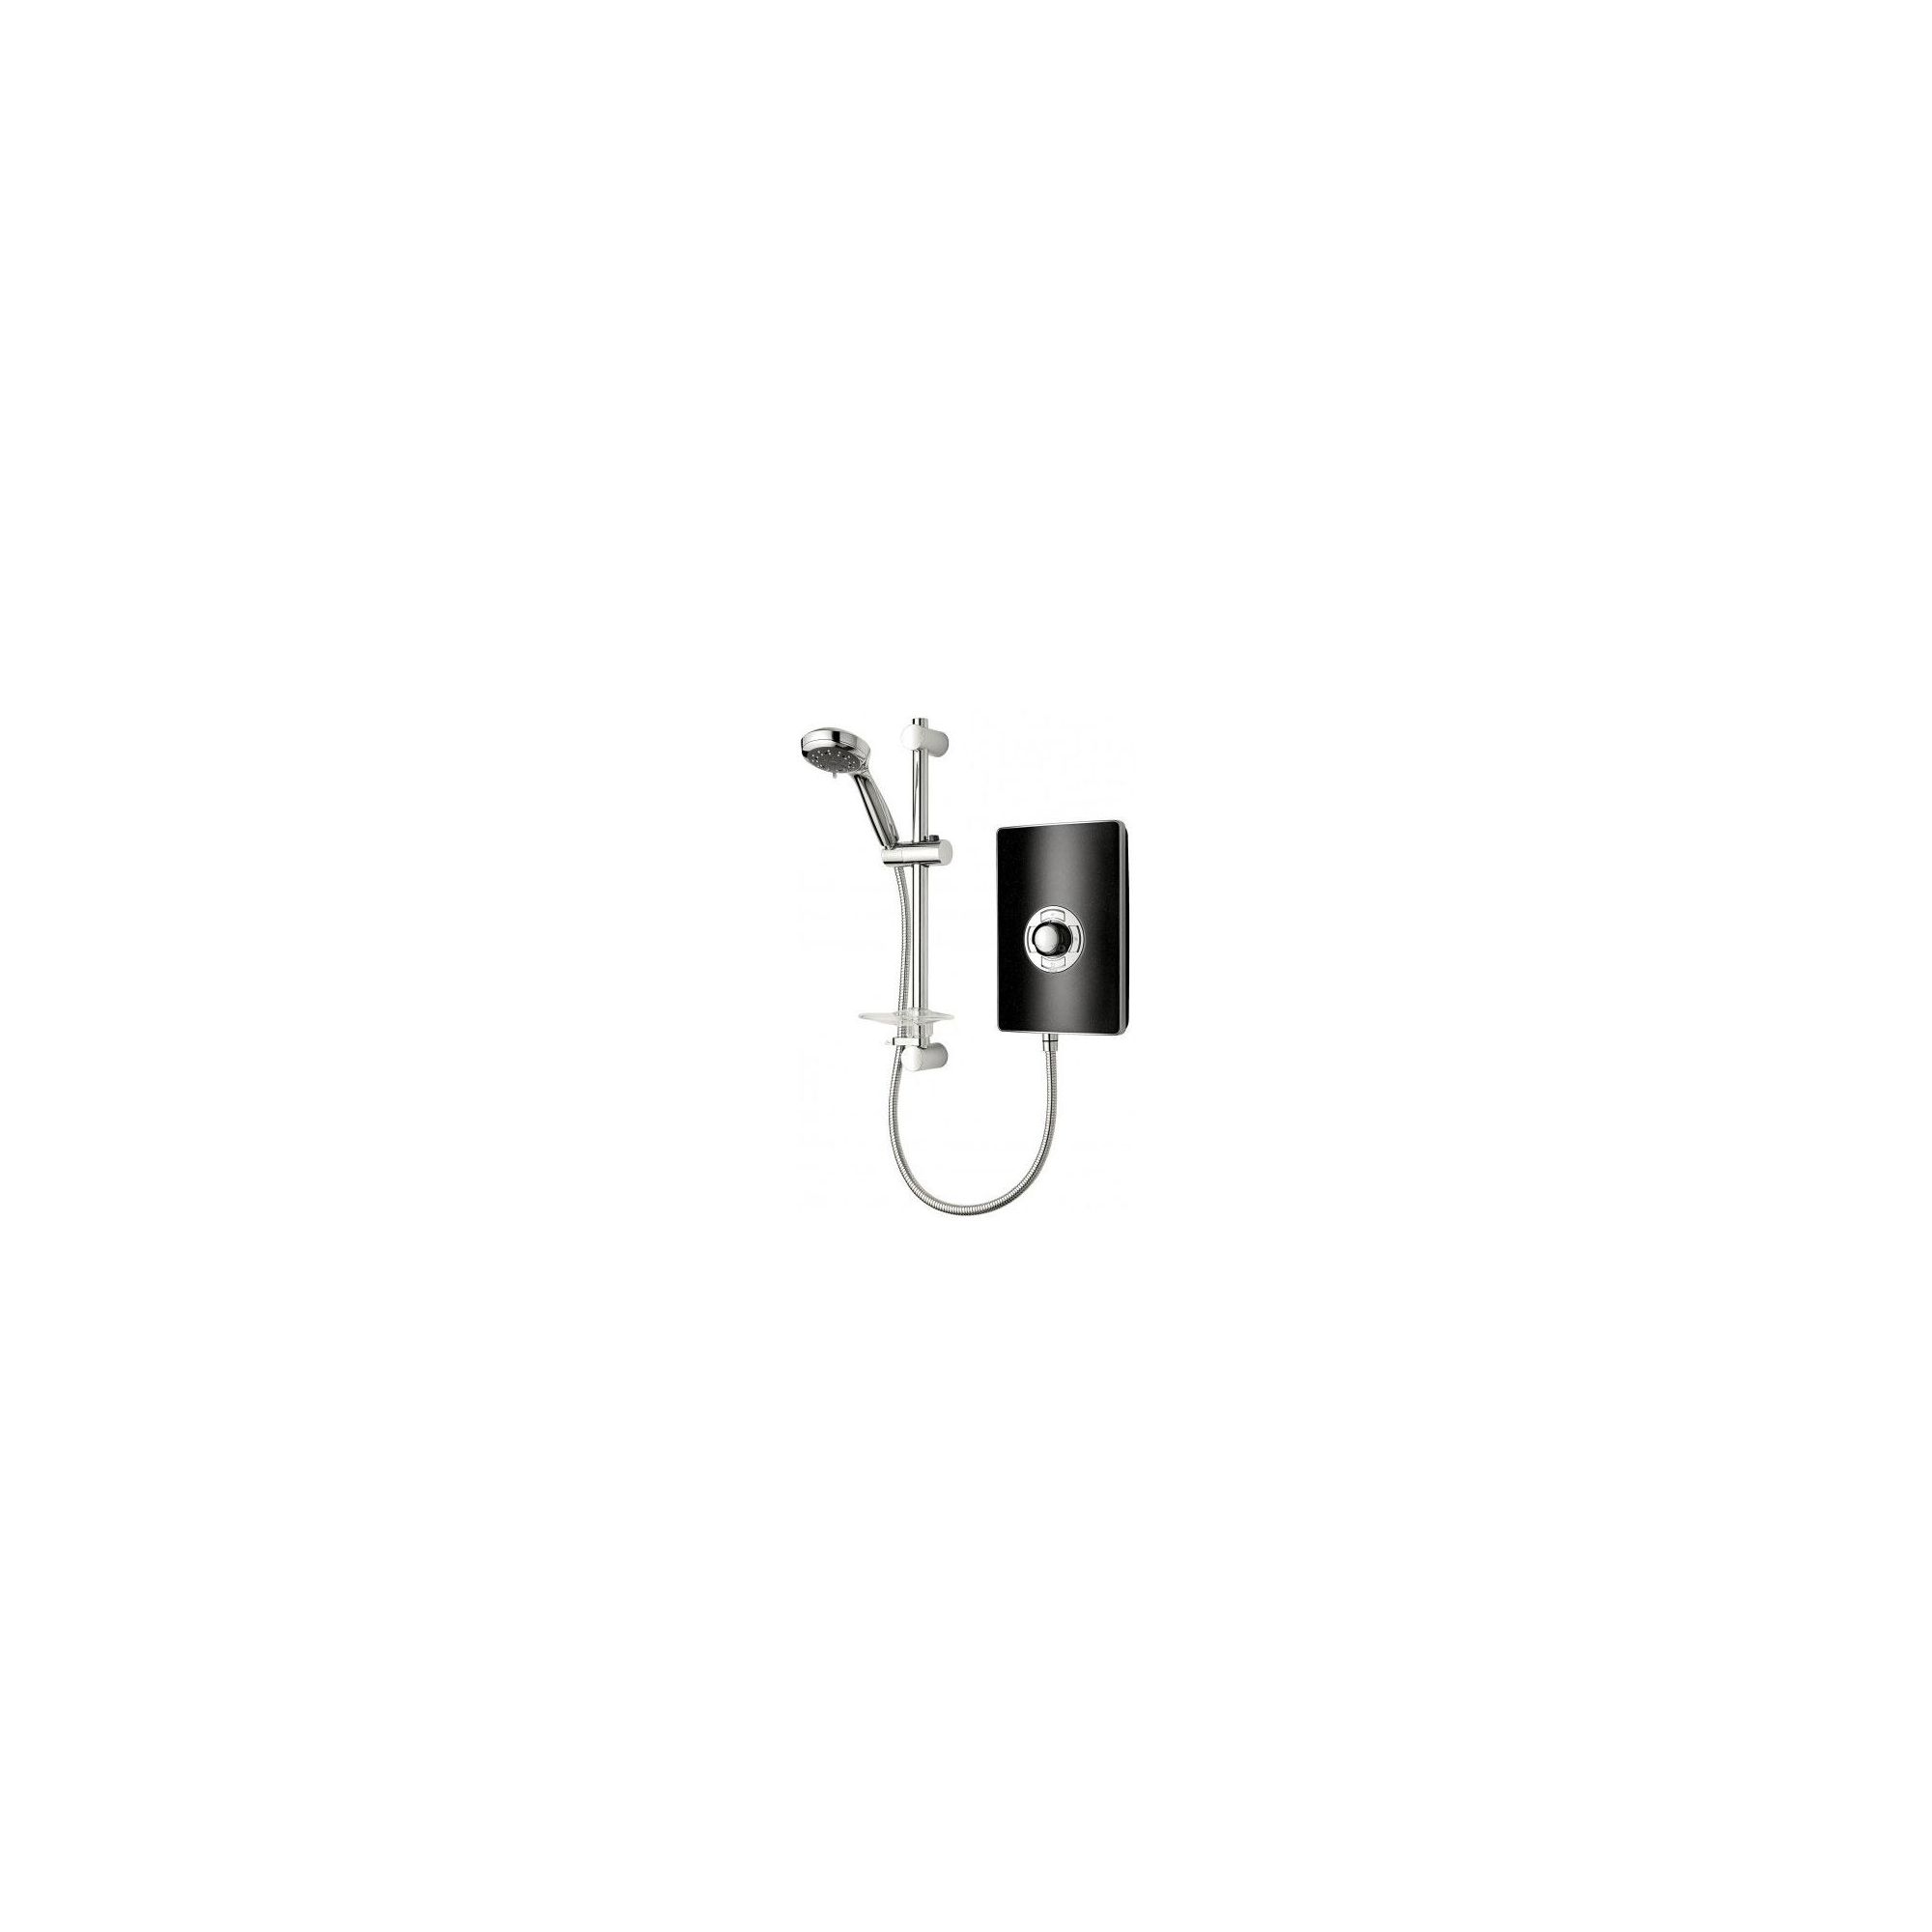 Triton Aspirante Electric Shower Black Pearl 8.5 kW at Tescos Direct